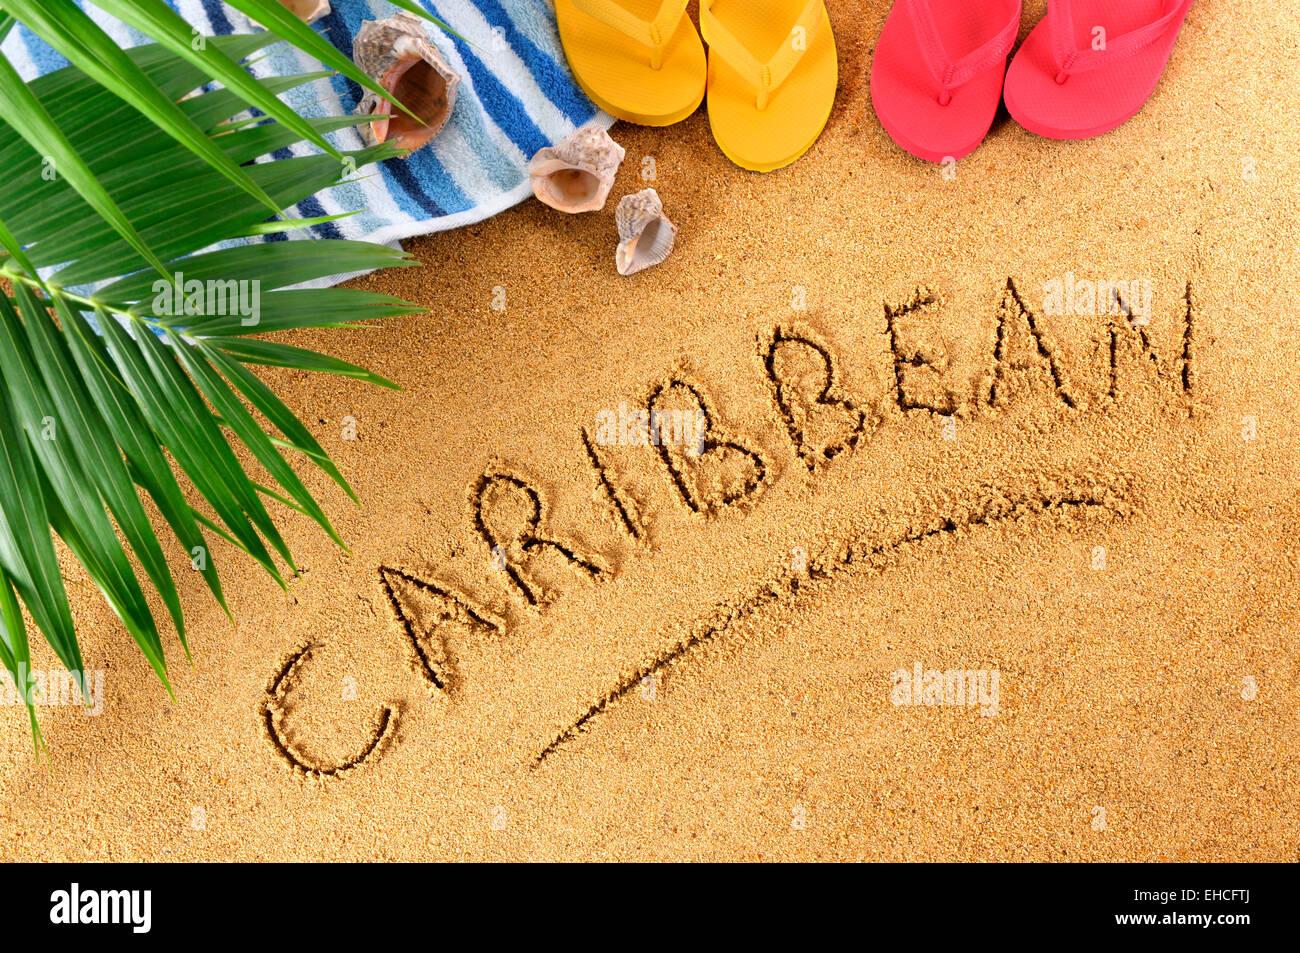 b8a616a7af4ec Caribbean beach background with towel